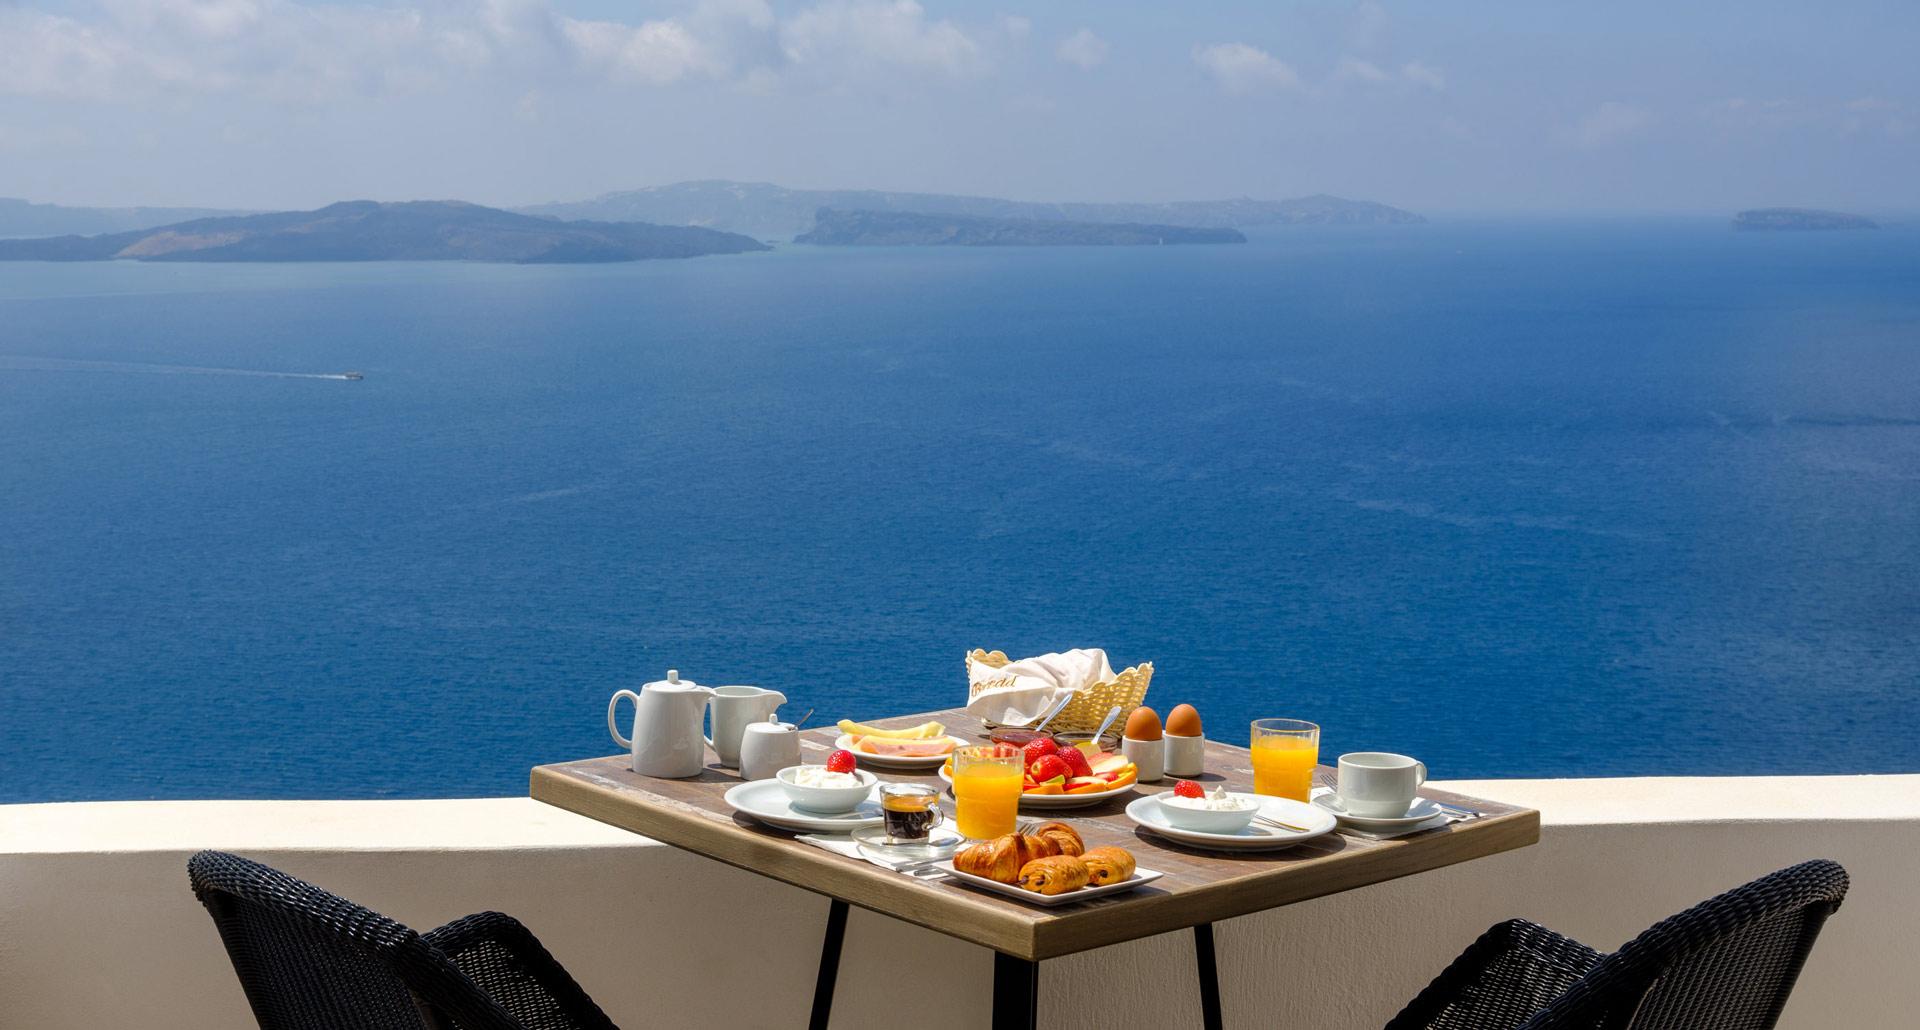 Santorini Hotels - Oia Santorini Apartments, Studios